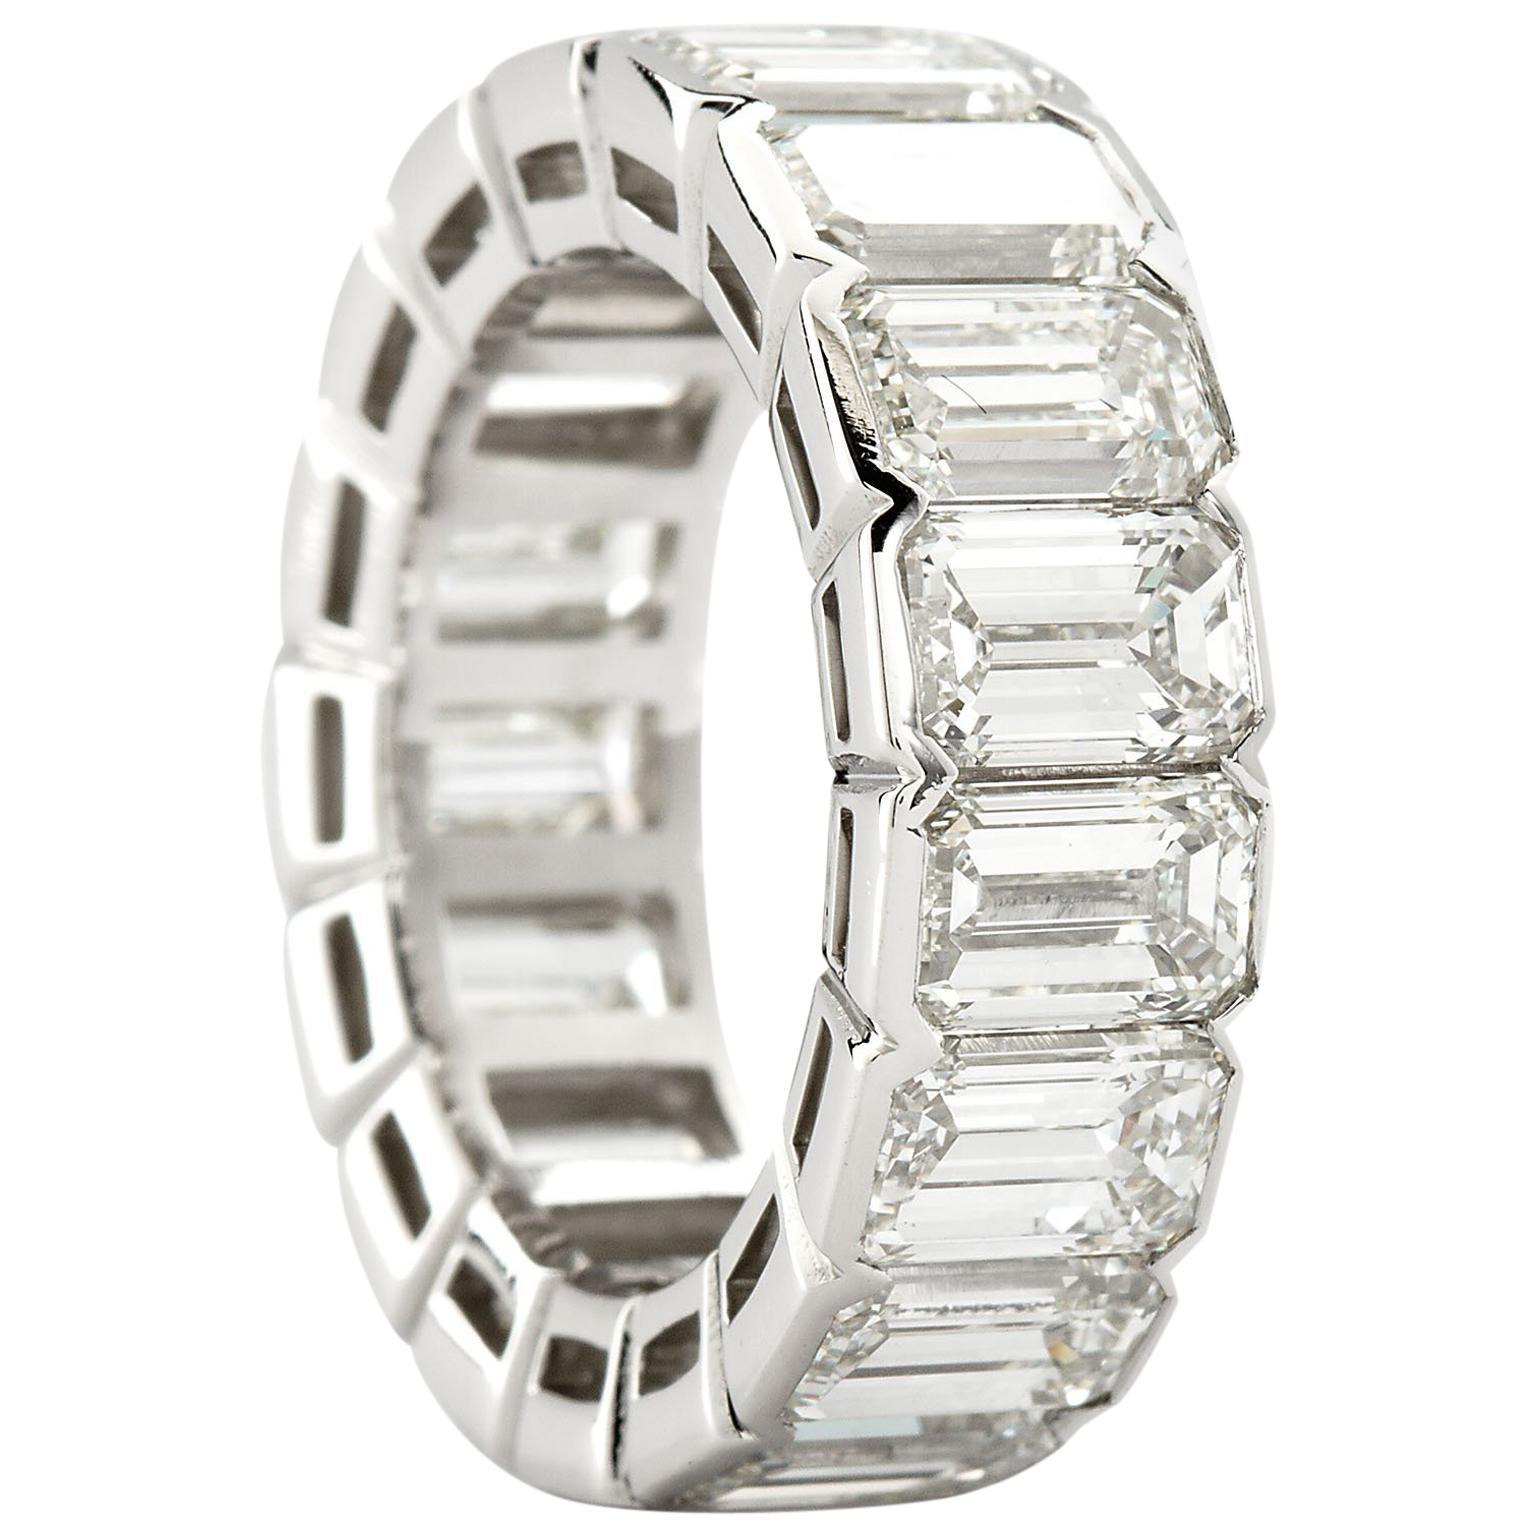 Platinum Emerald Cut Diamond Eternity Band 17 Diamonds 12.00 Carat GIA Certified